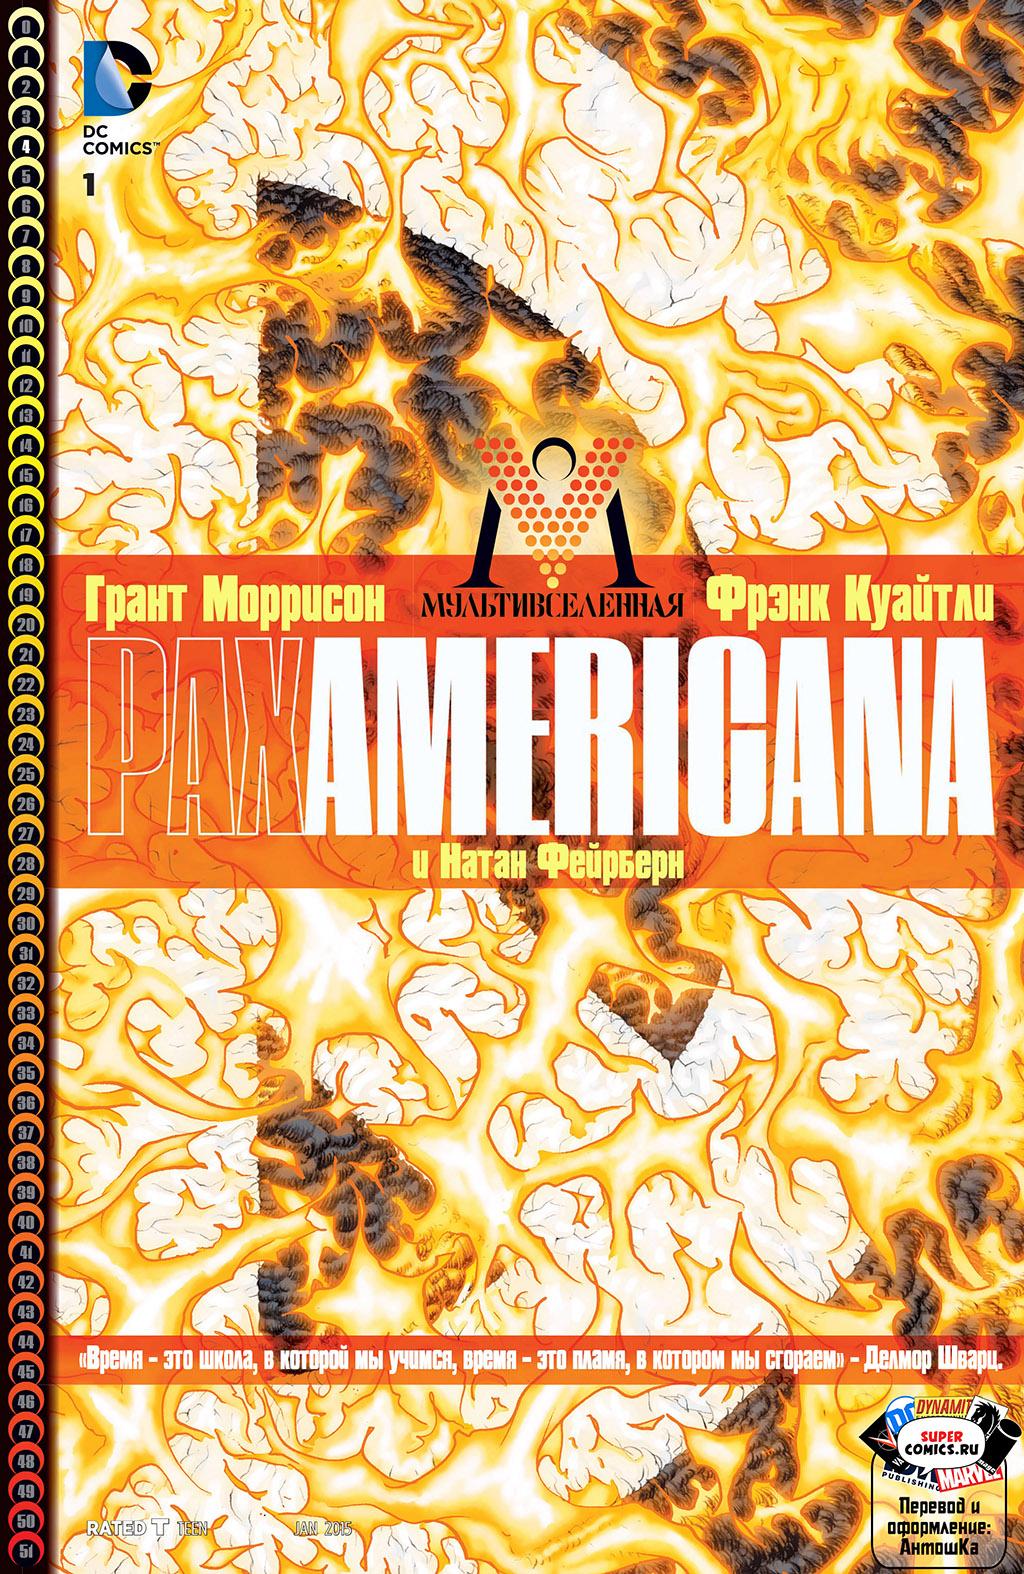 Комикс Pax Americana